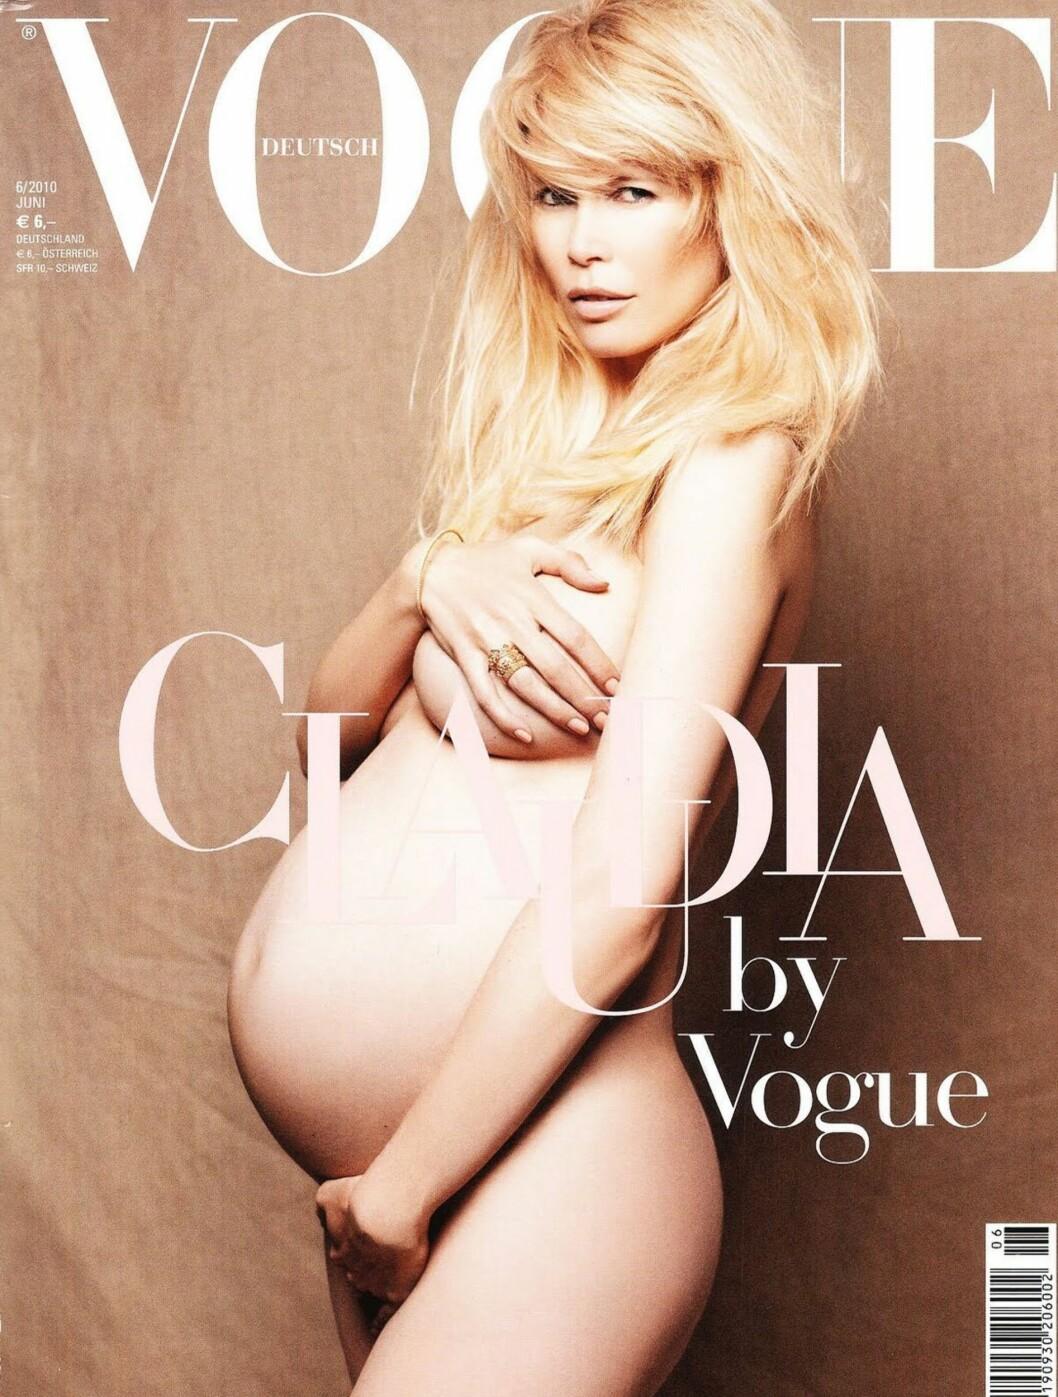 KOPIERTE DEMI: Claudia Schiffer. Foto: Faksimile Vogue